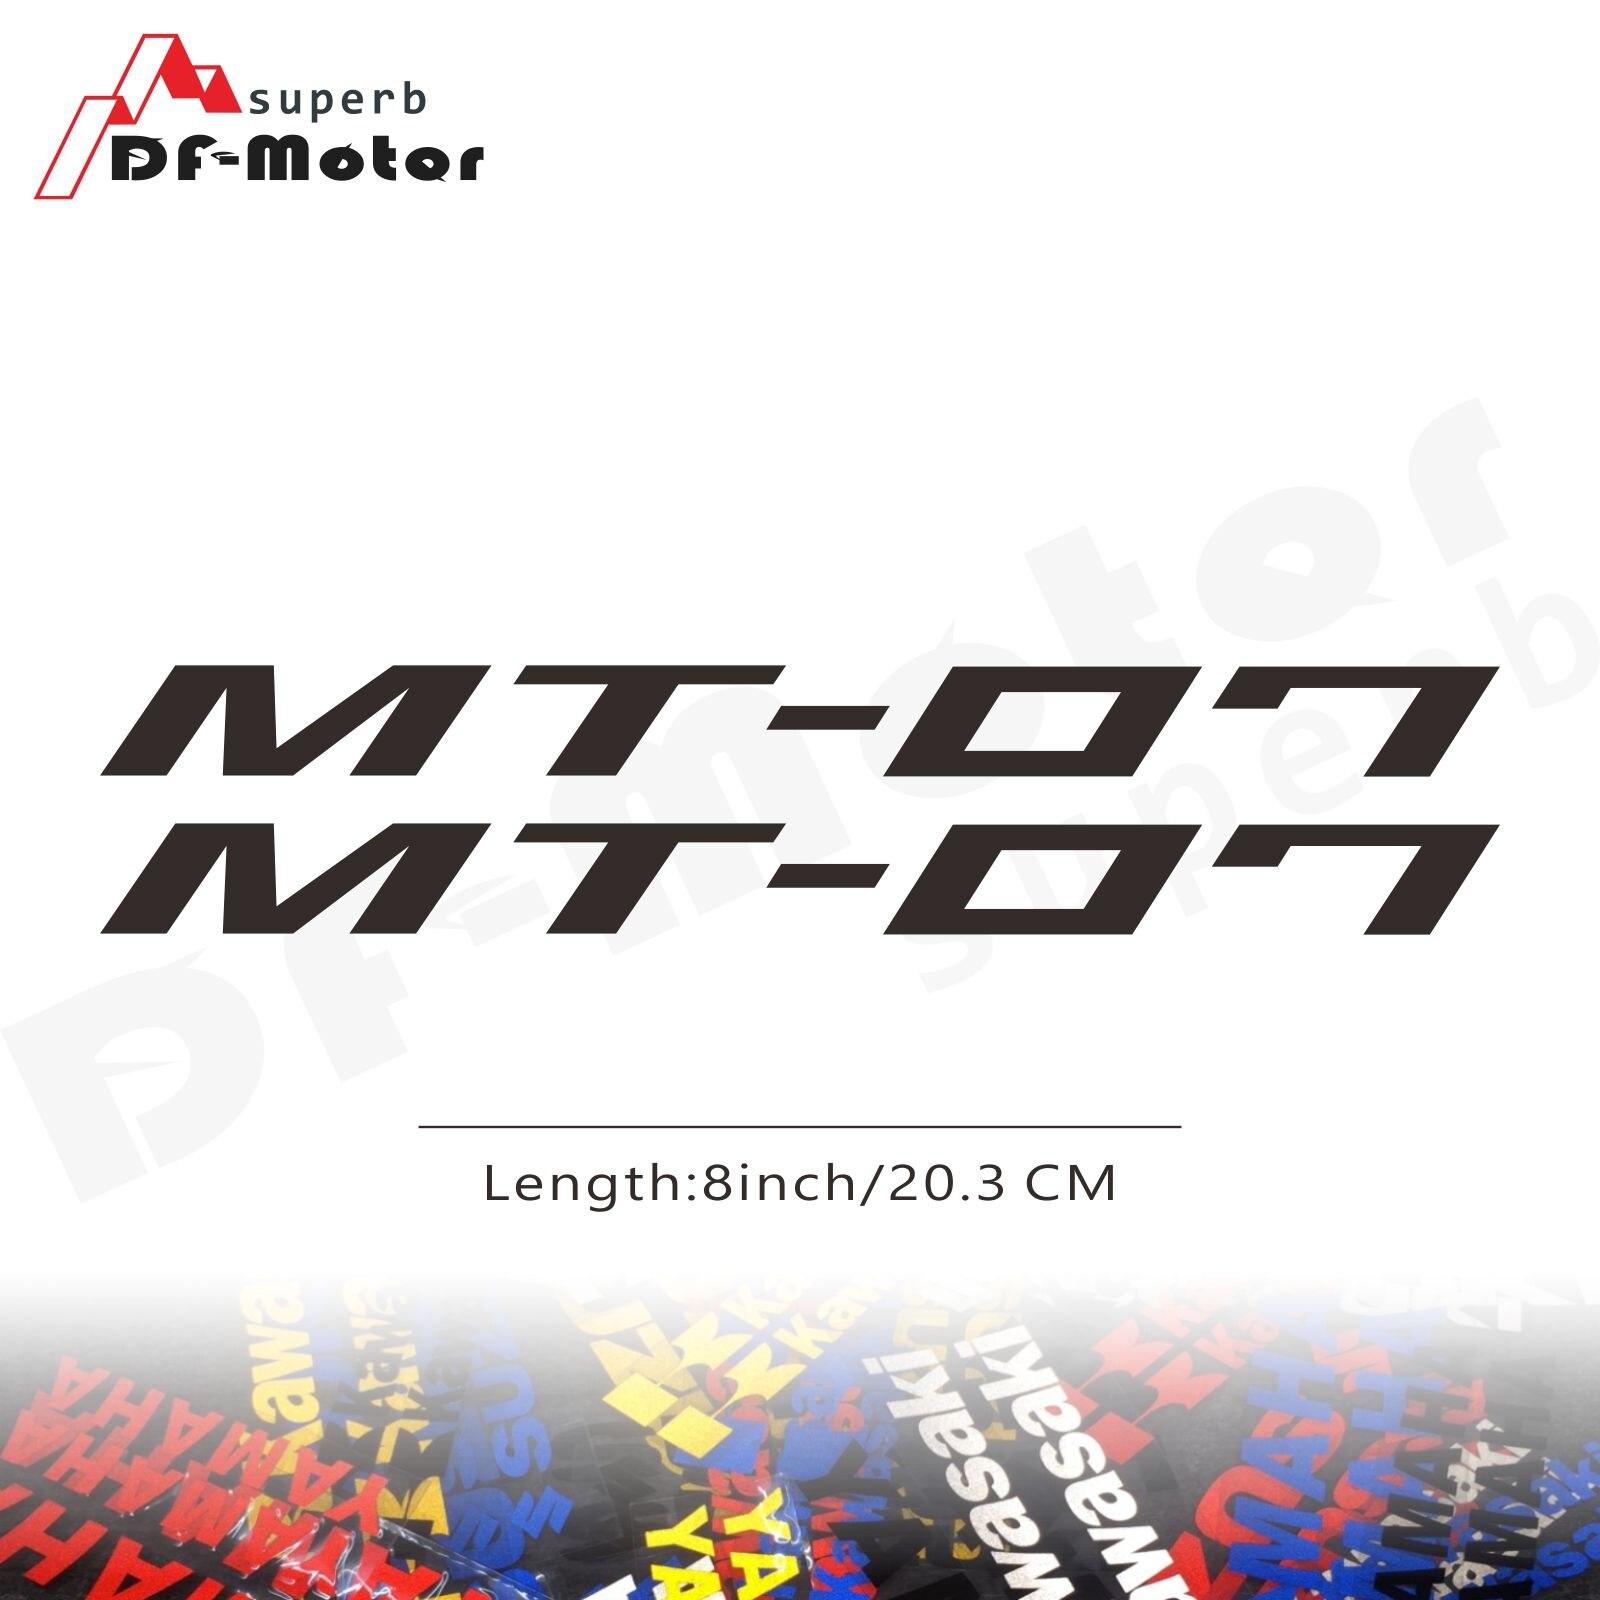 8Inch Reflective Sticker Decal Motorcycle Car Sticker Wheels Fairing Helmet Sticker Decal For Yamaha MT-07 MT 07 MT07